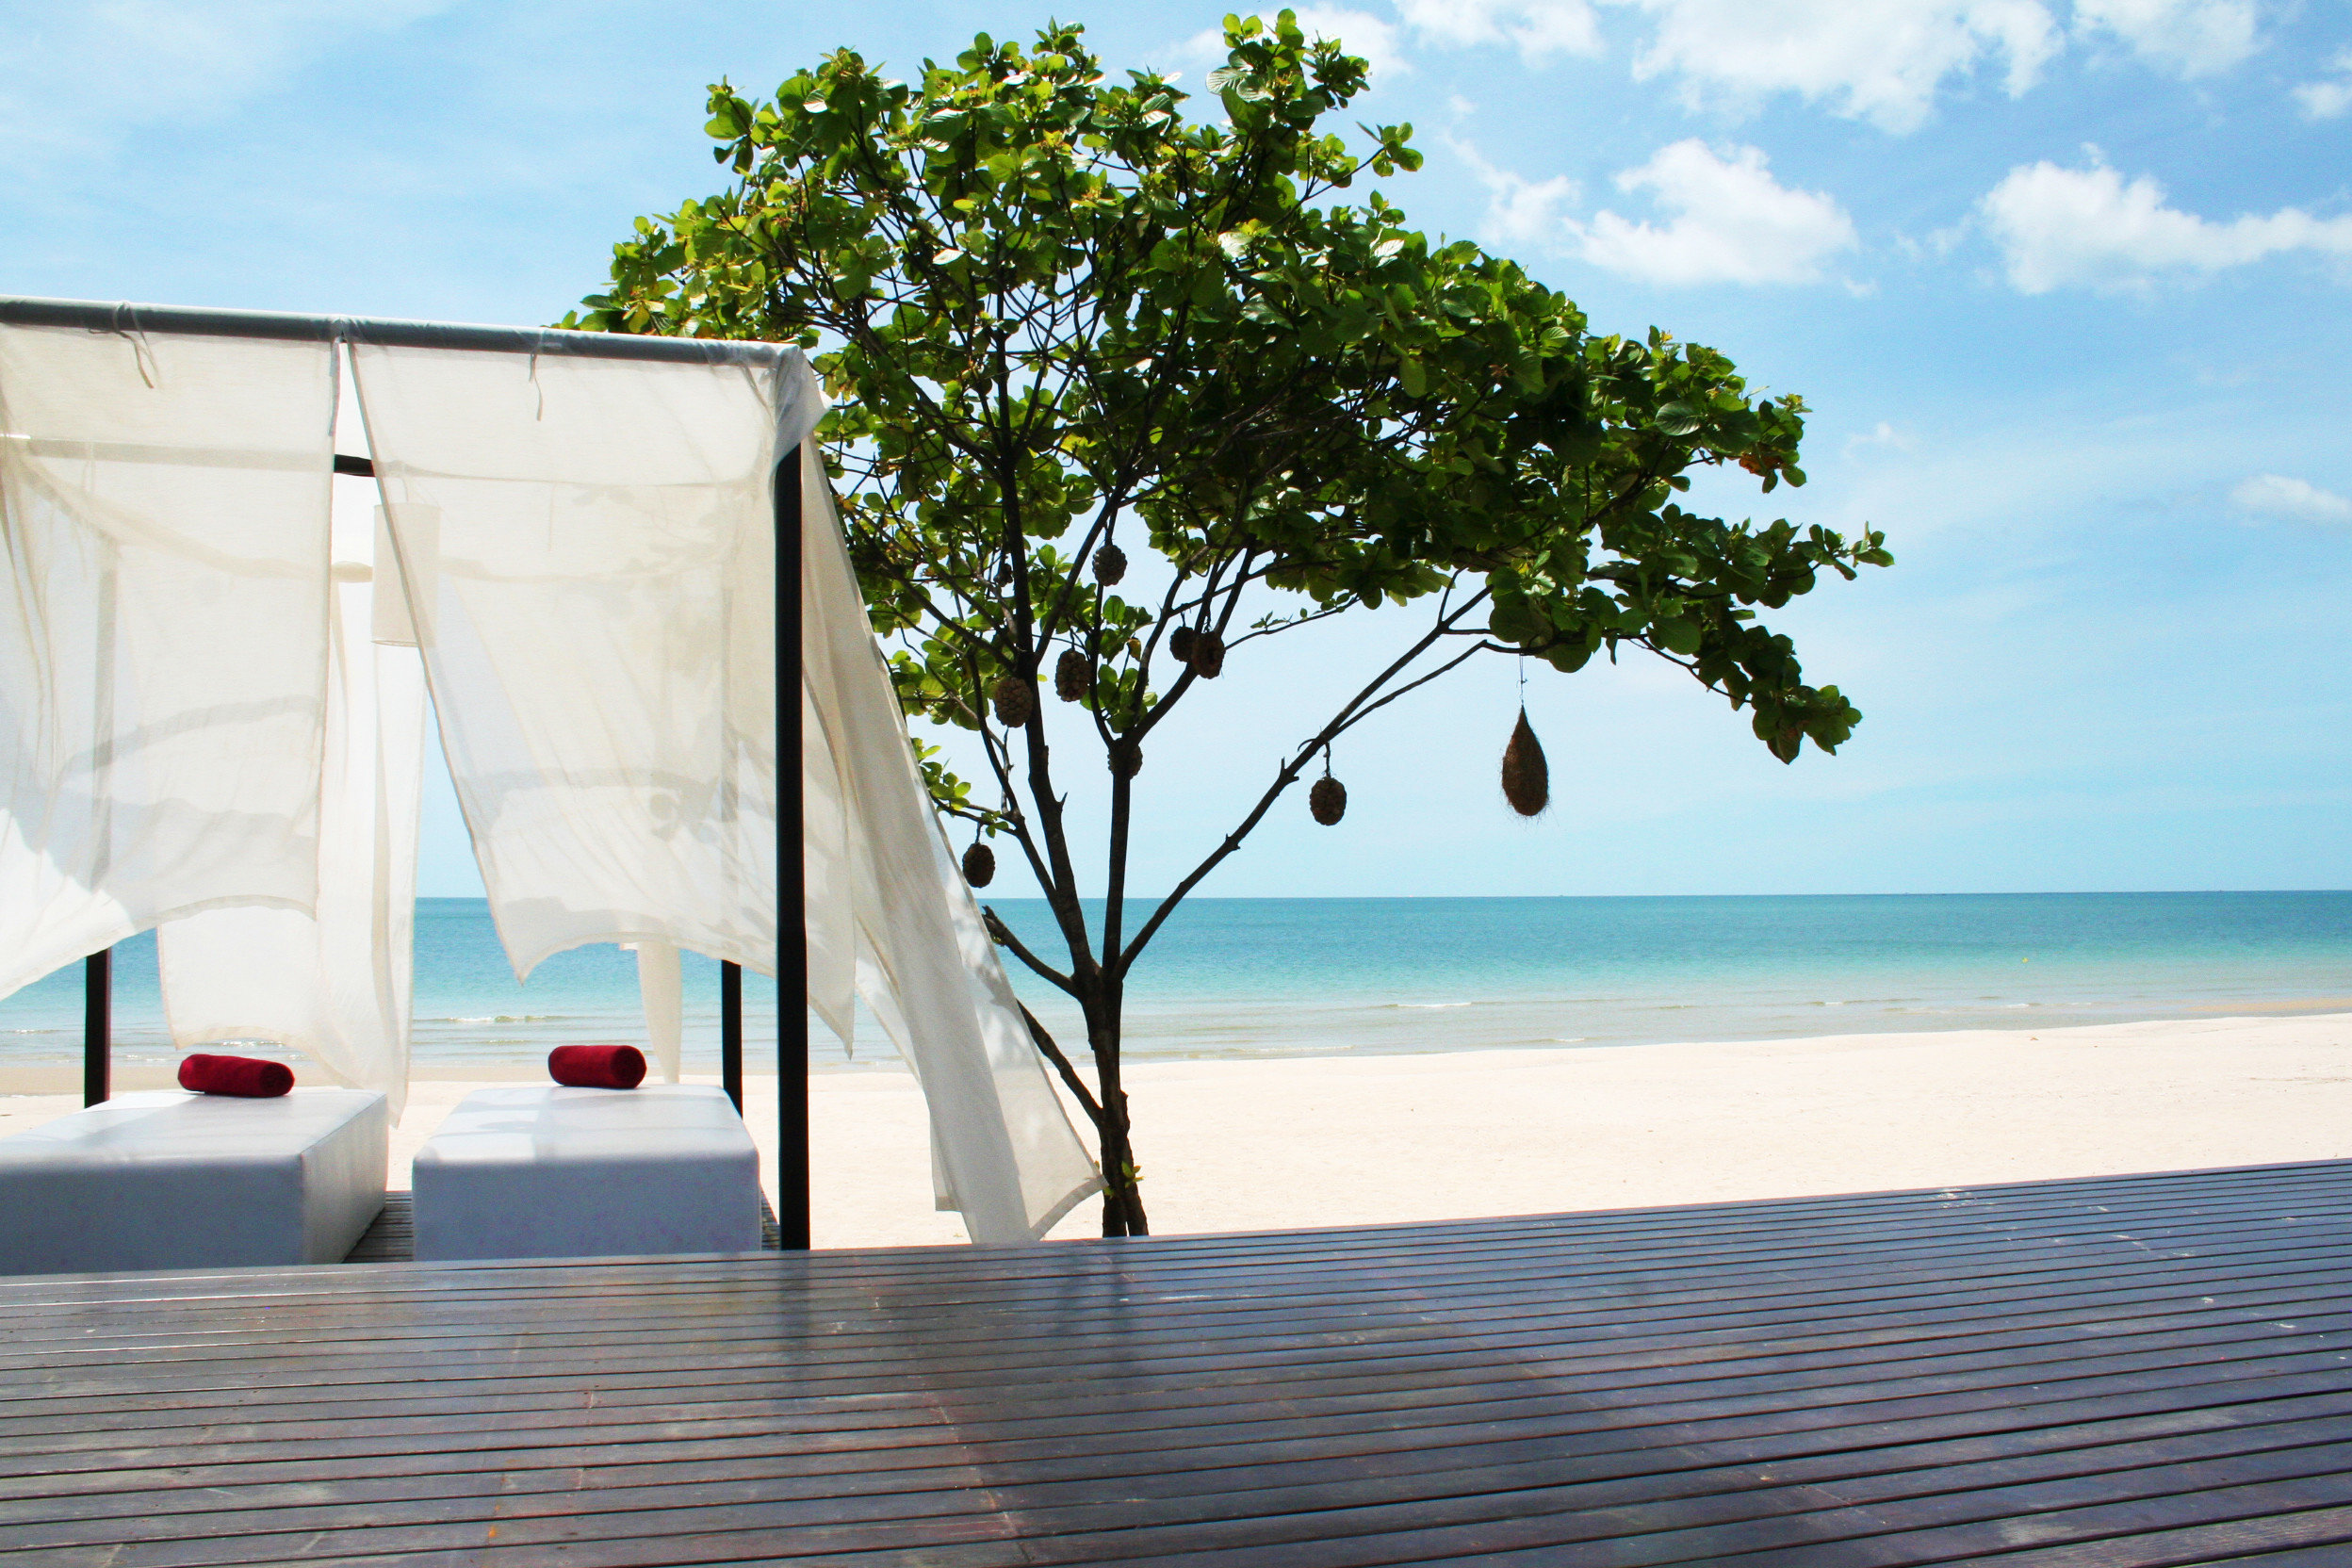 Adventure Beach Beachfront Lounge Ocean Outdoors sky Sea swimming pool shore